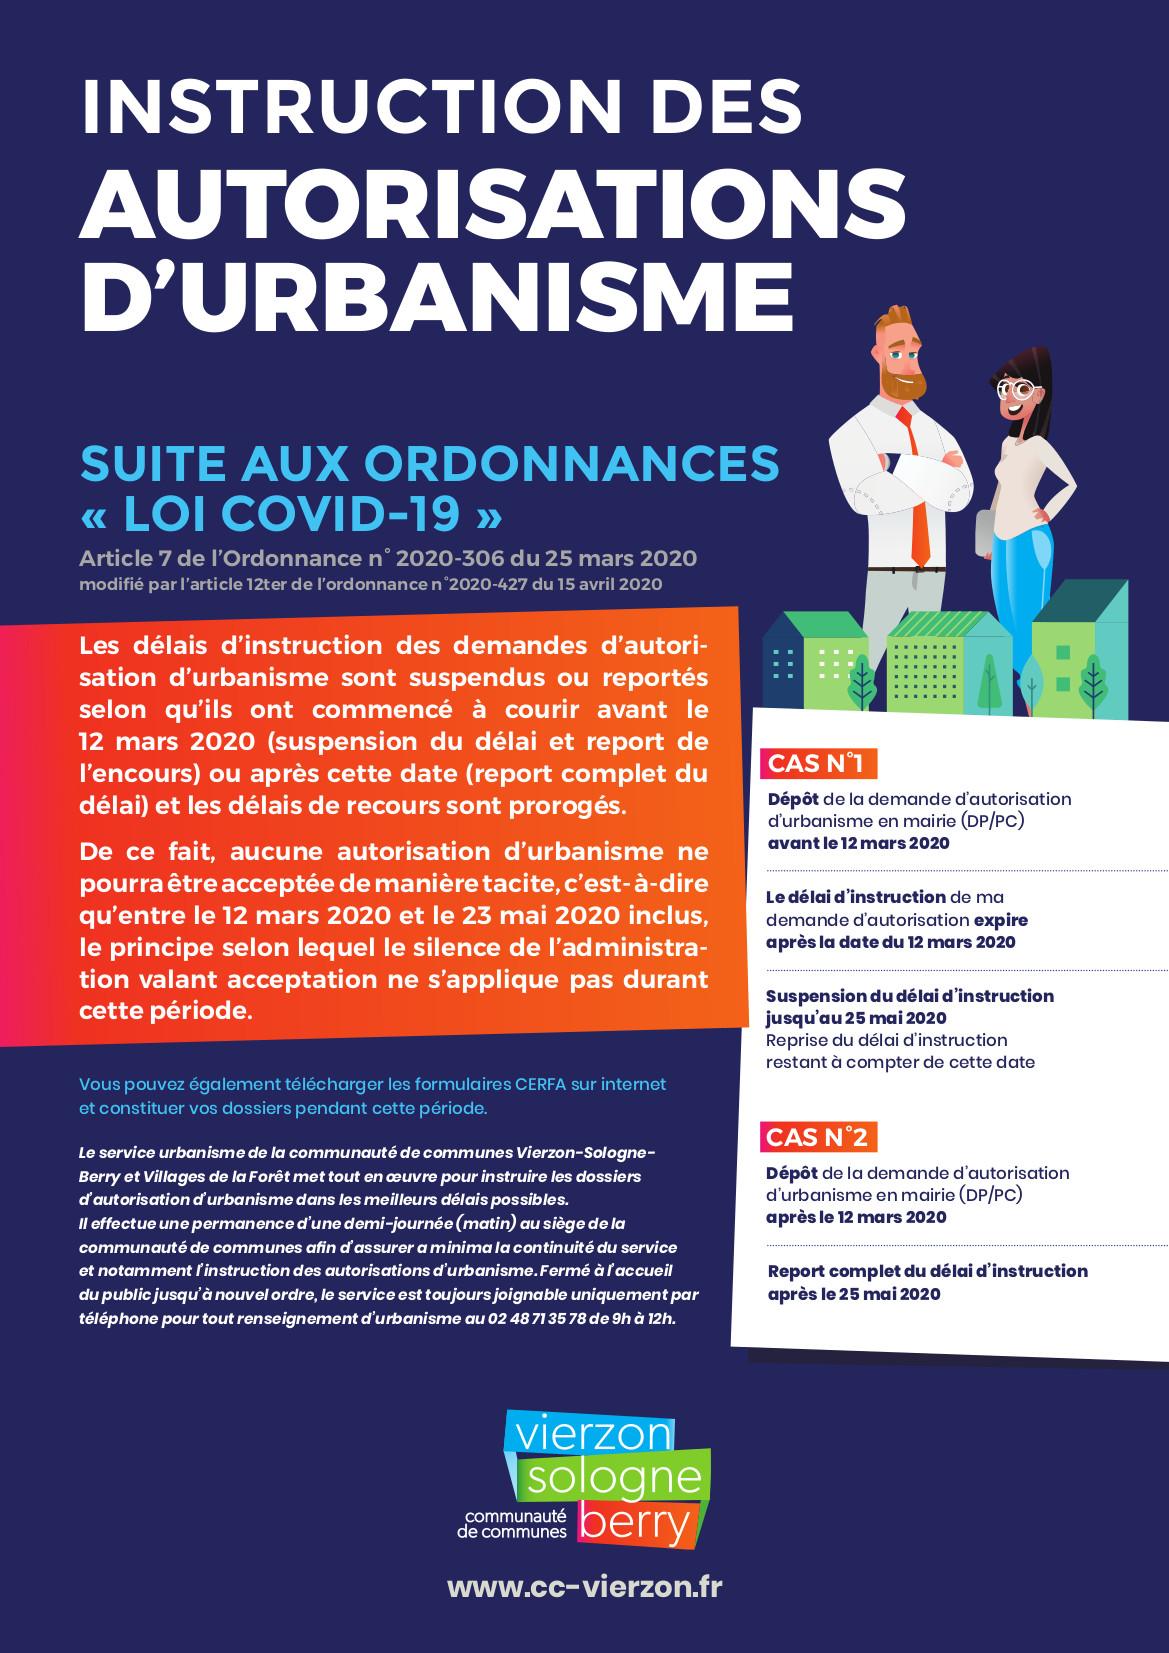 URBANISME - CCVSB